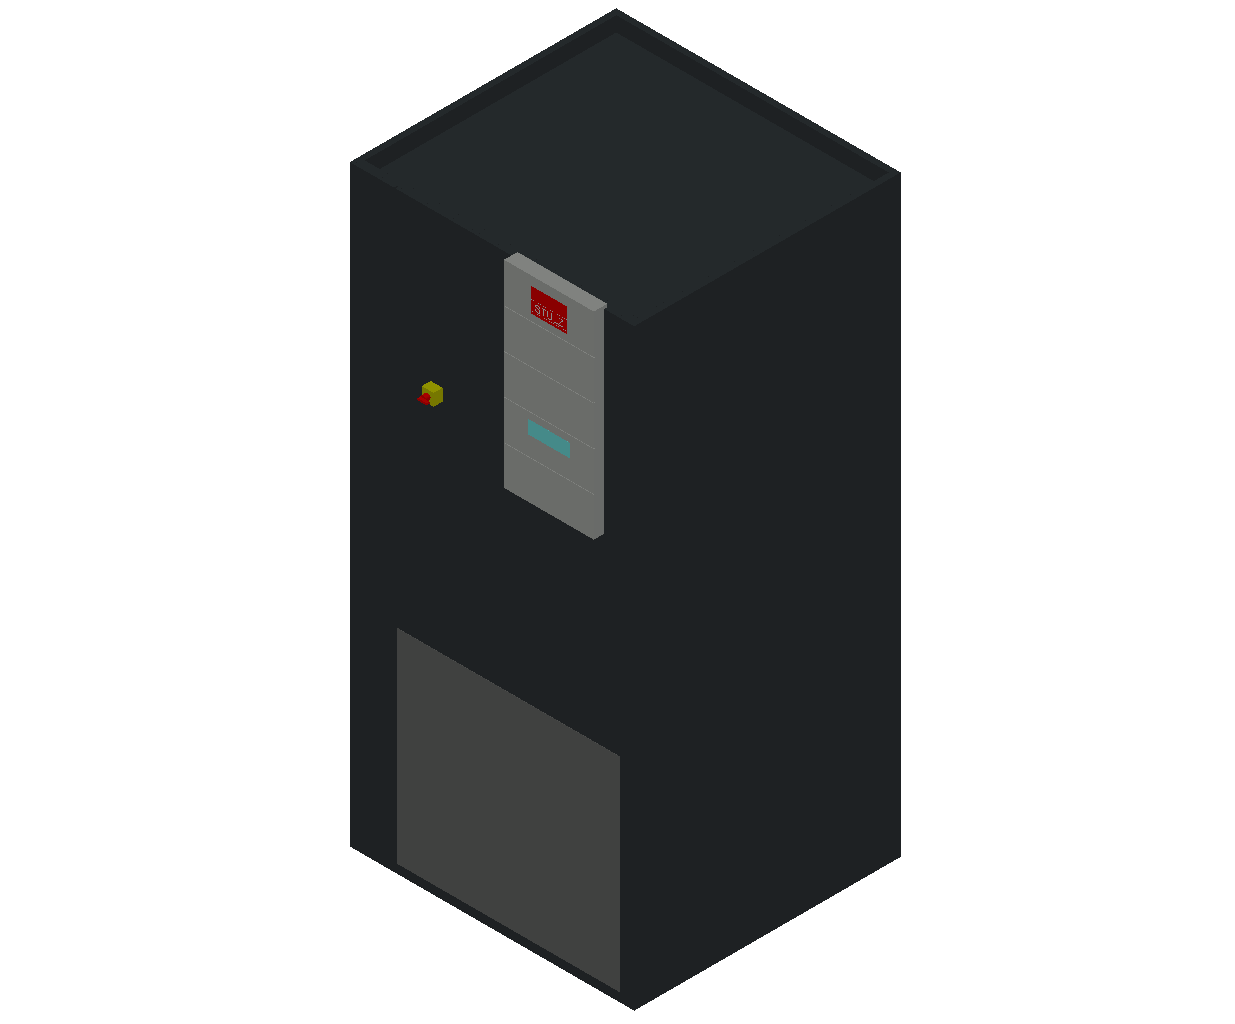 HC_Air Conditioner_Indoor Unit_MEPcontent_STULZ_CyberAir 3PRO_ASU_Single Circuit AS_ASU_341_AS_INT-EN.dwg